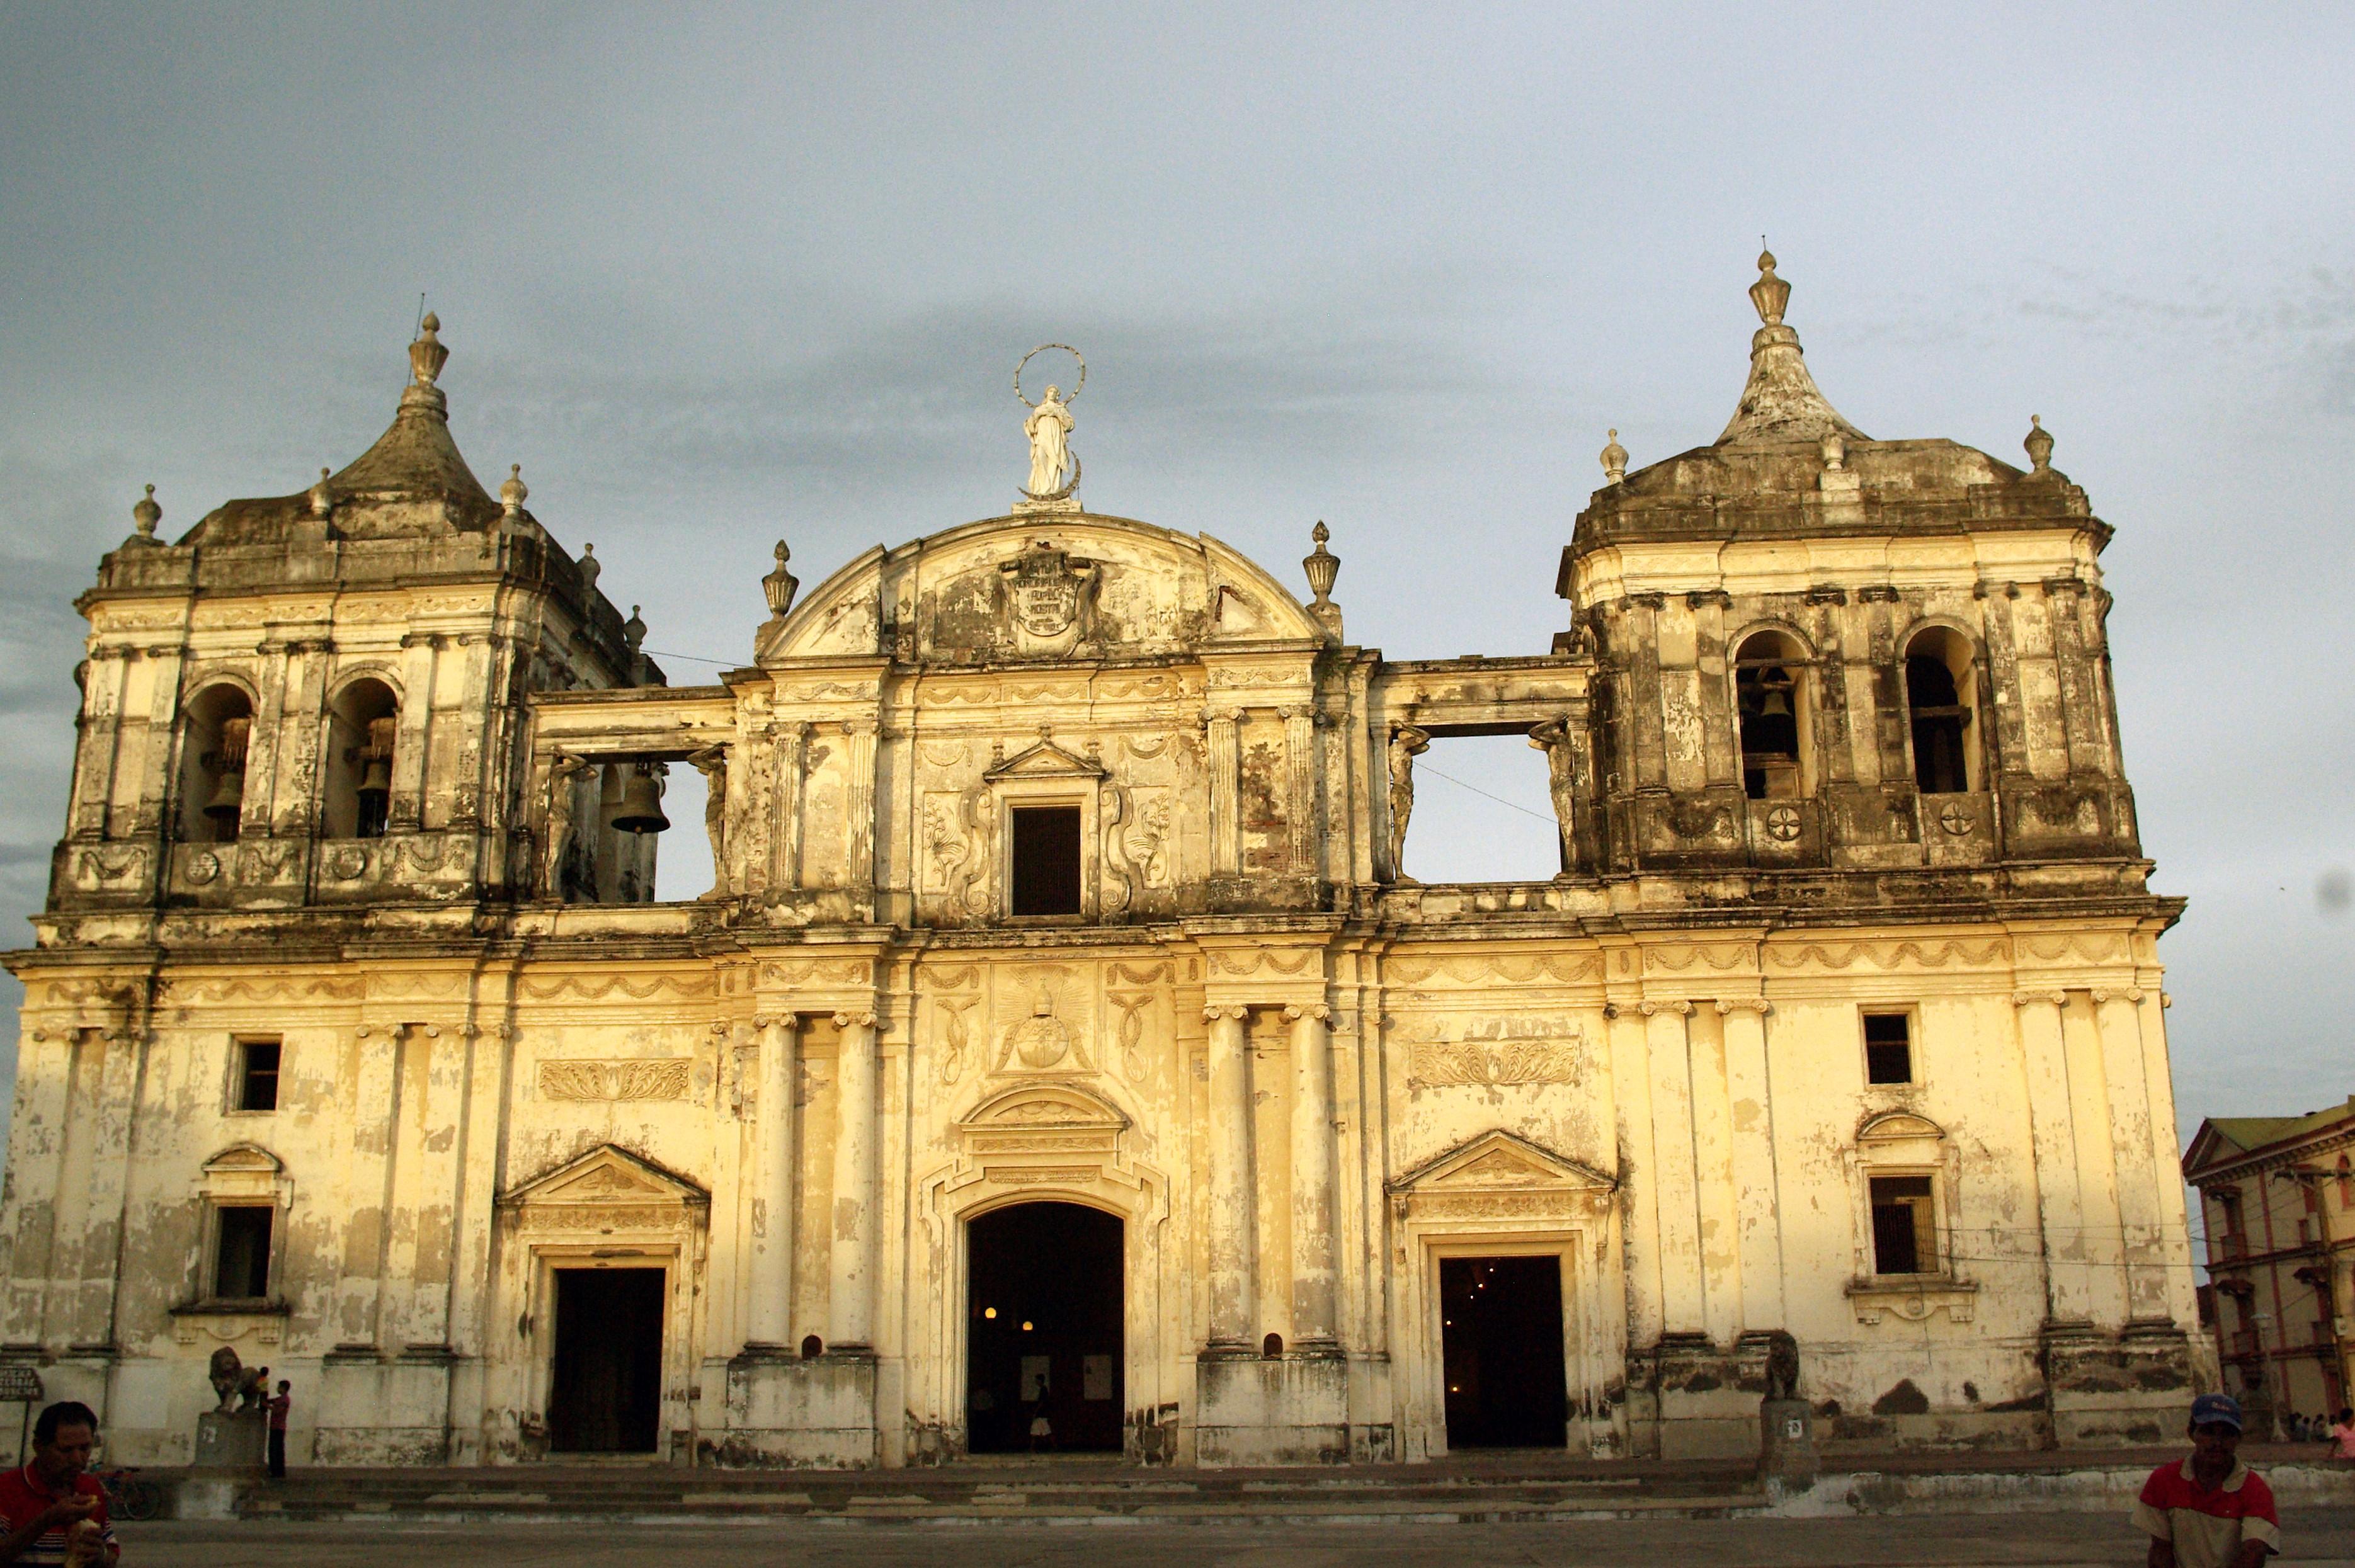 File:Catedral de la Asunción, León.jpg - Wikimedia Commons